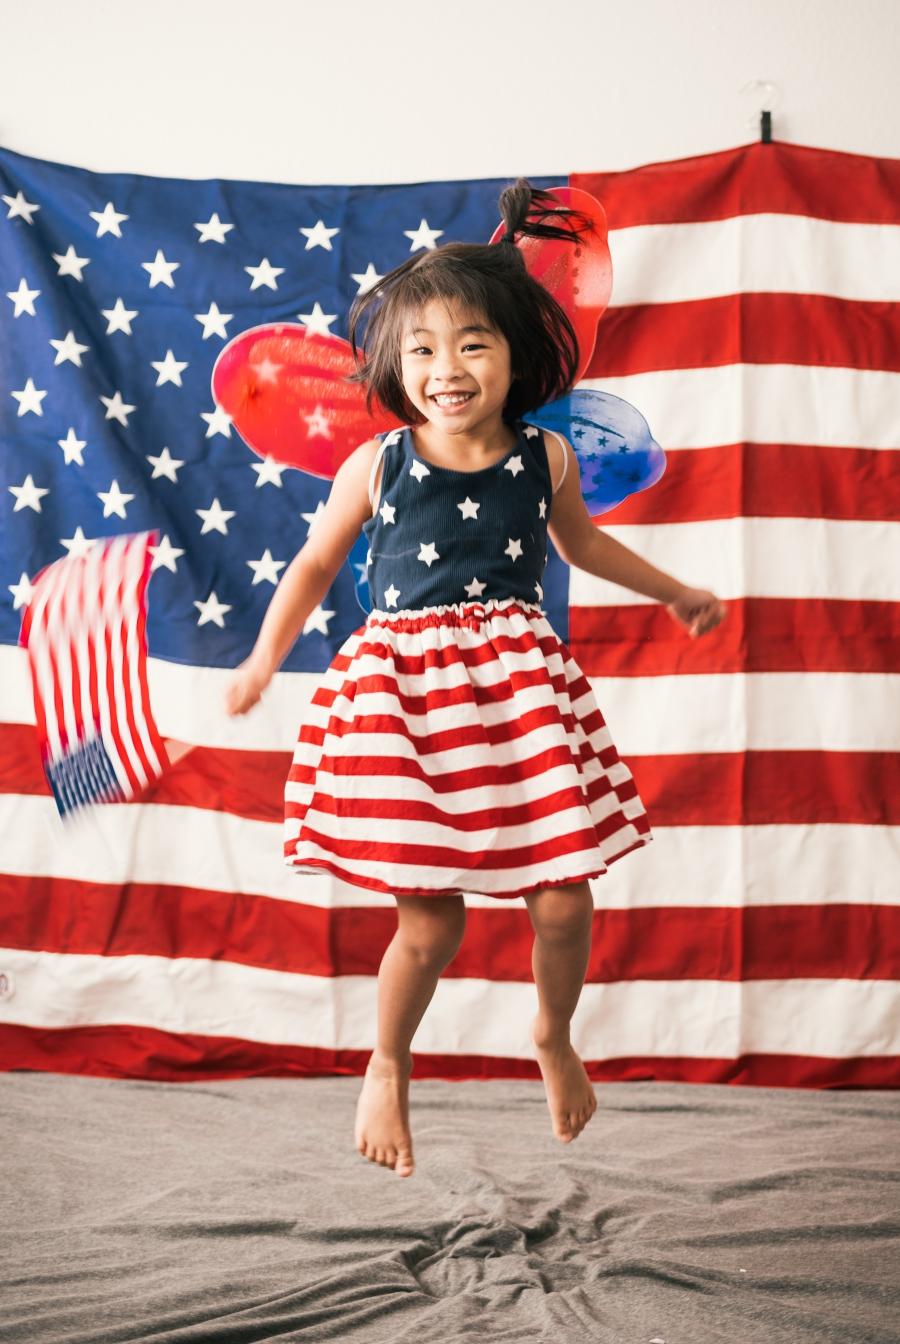 4th of July flag photoshoot 7.jpg